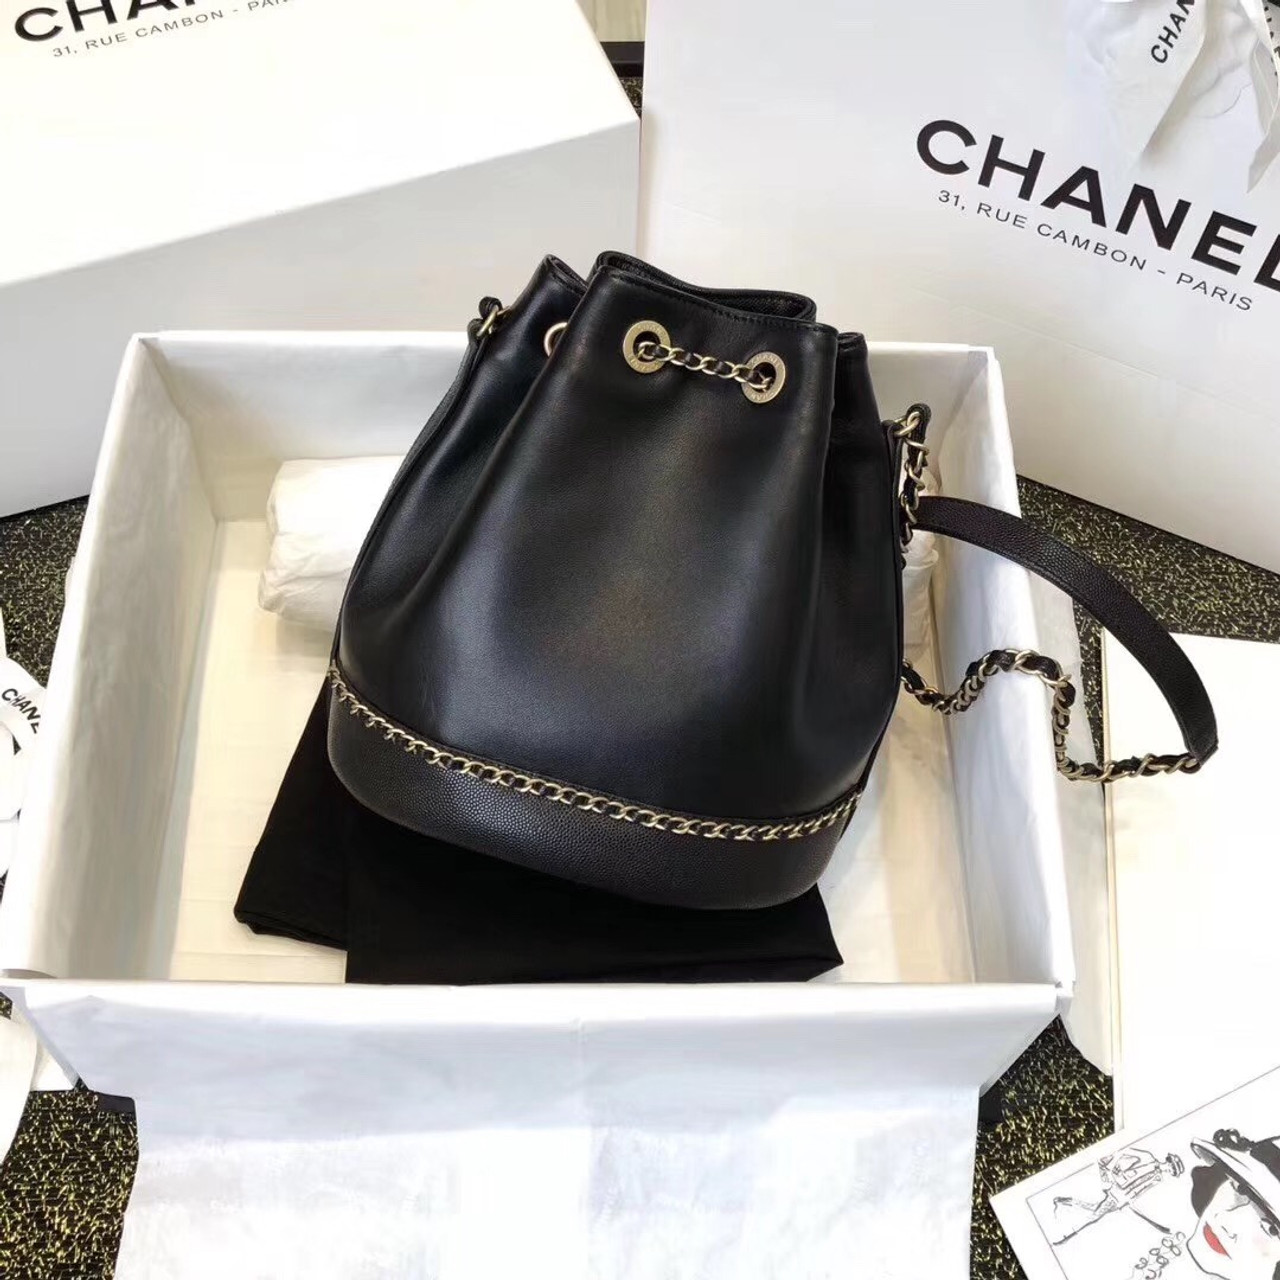 b486549c2980 Chanel Drawstring Bag AS373 Black - Bella Vita Moda